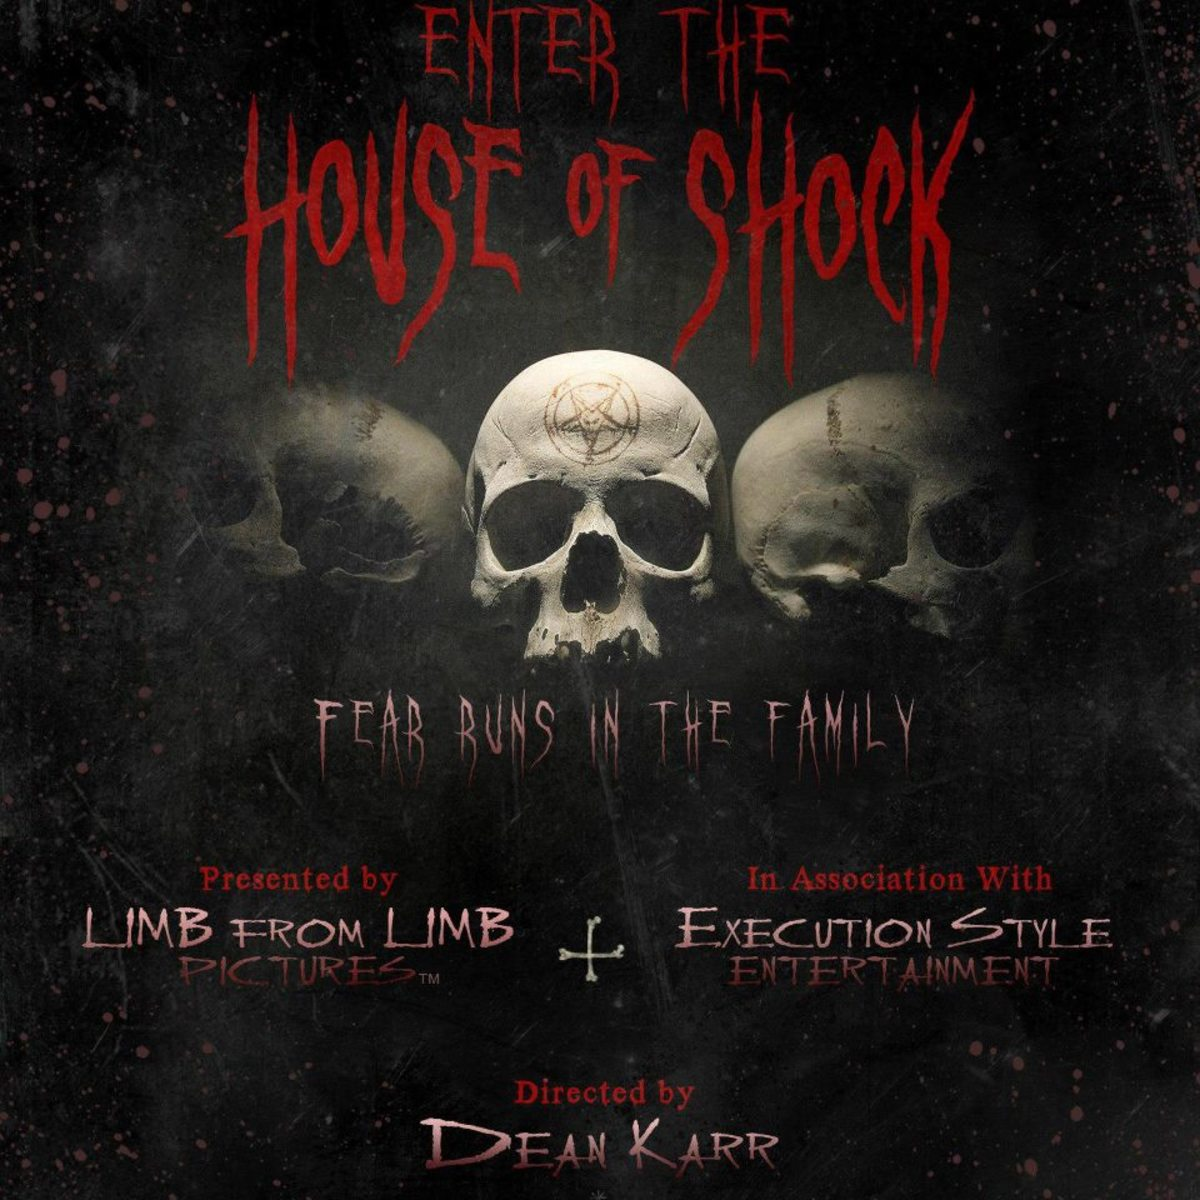 the-house-of-shock-documentary-shock-u-mentally